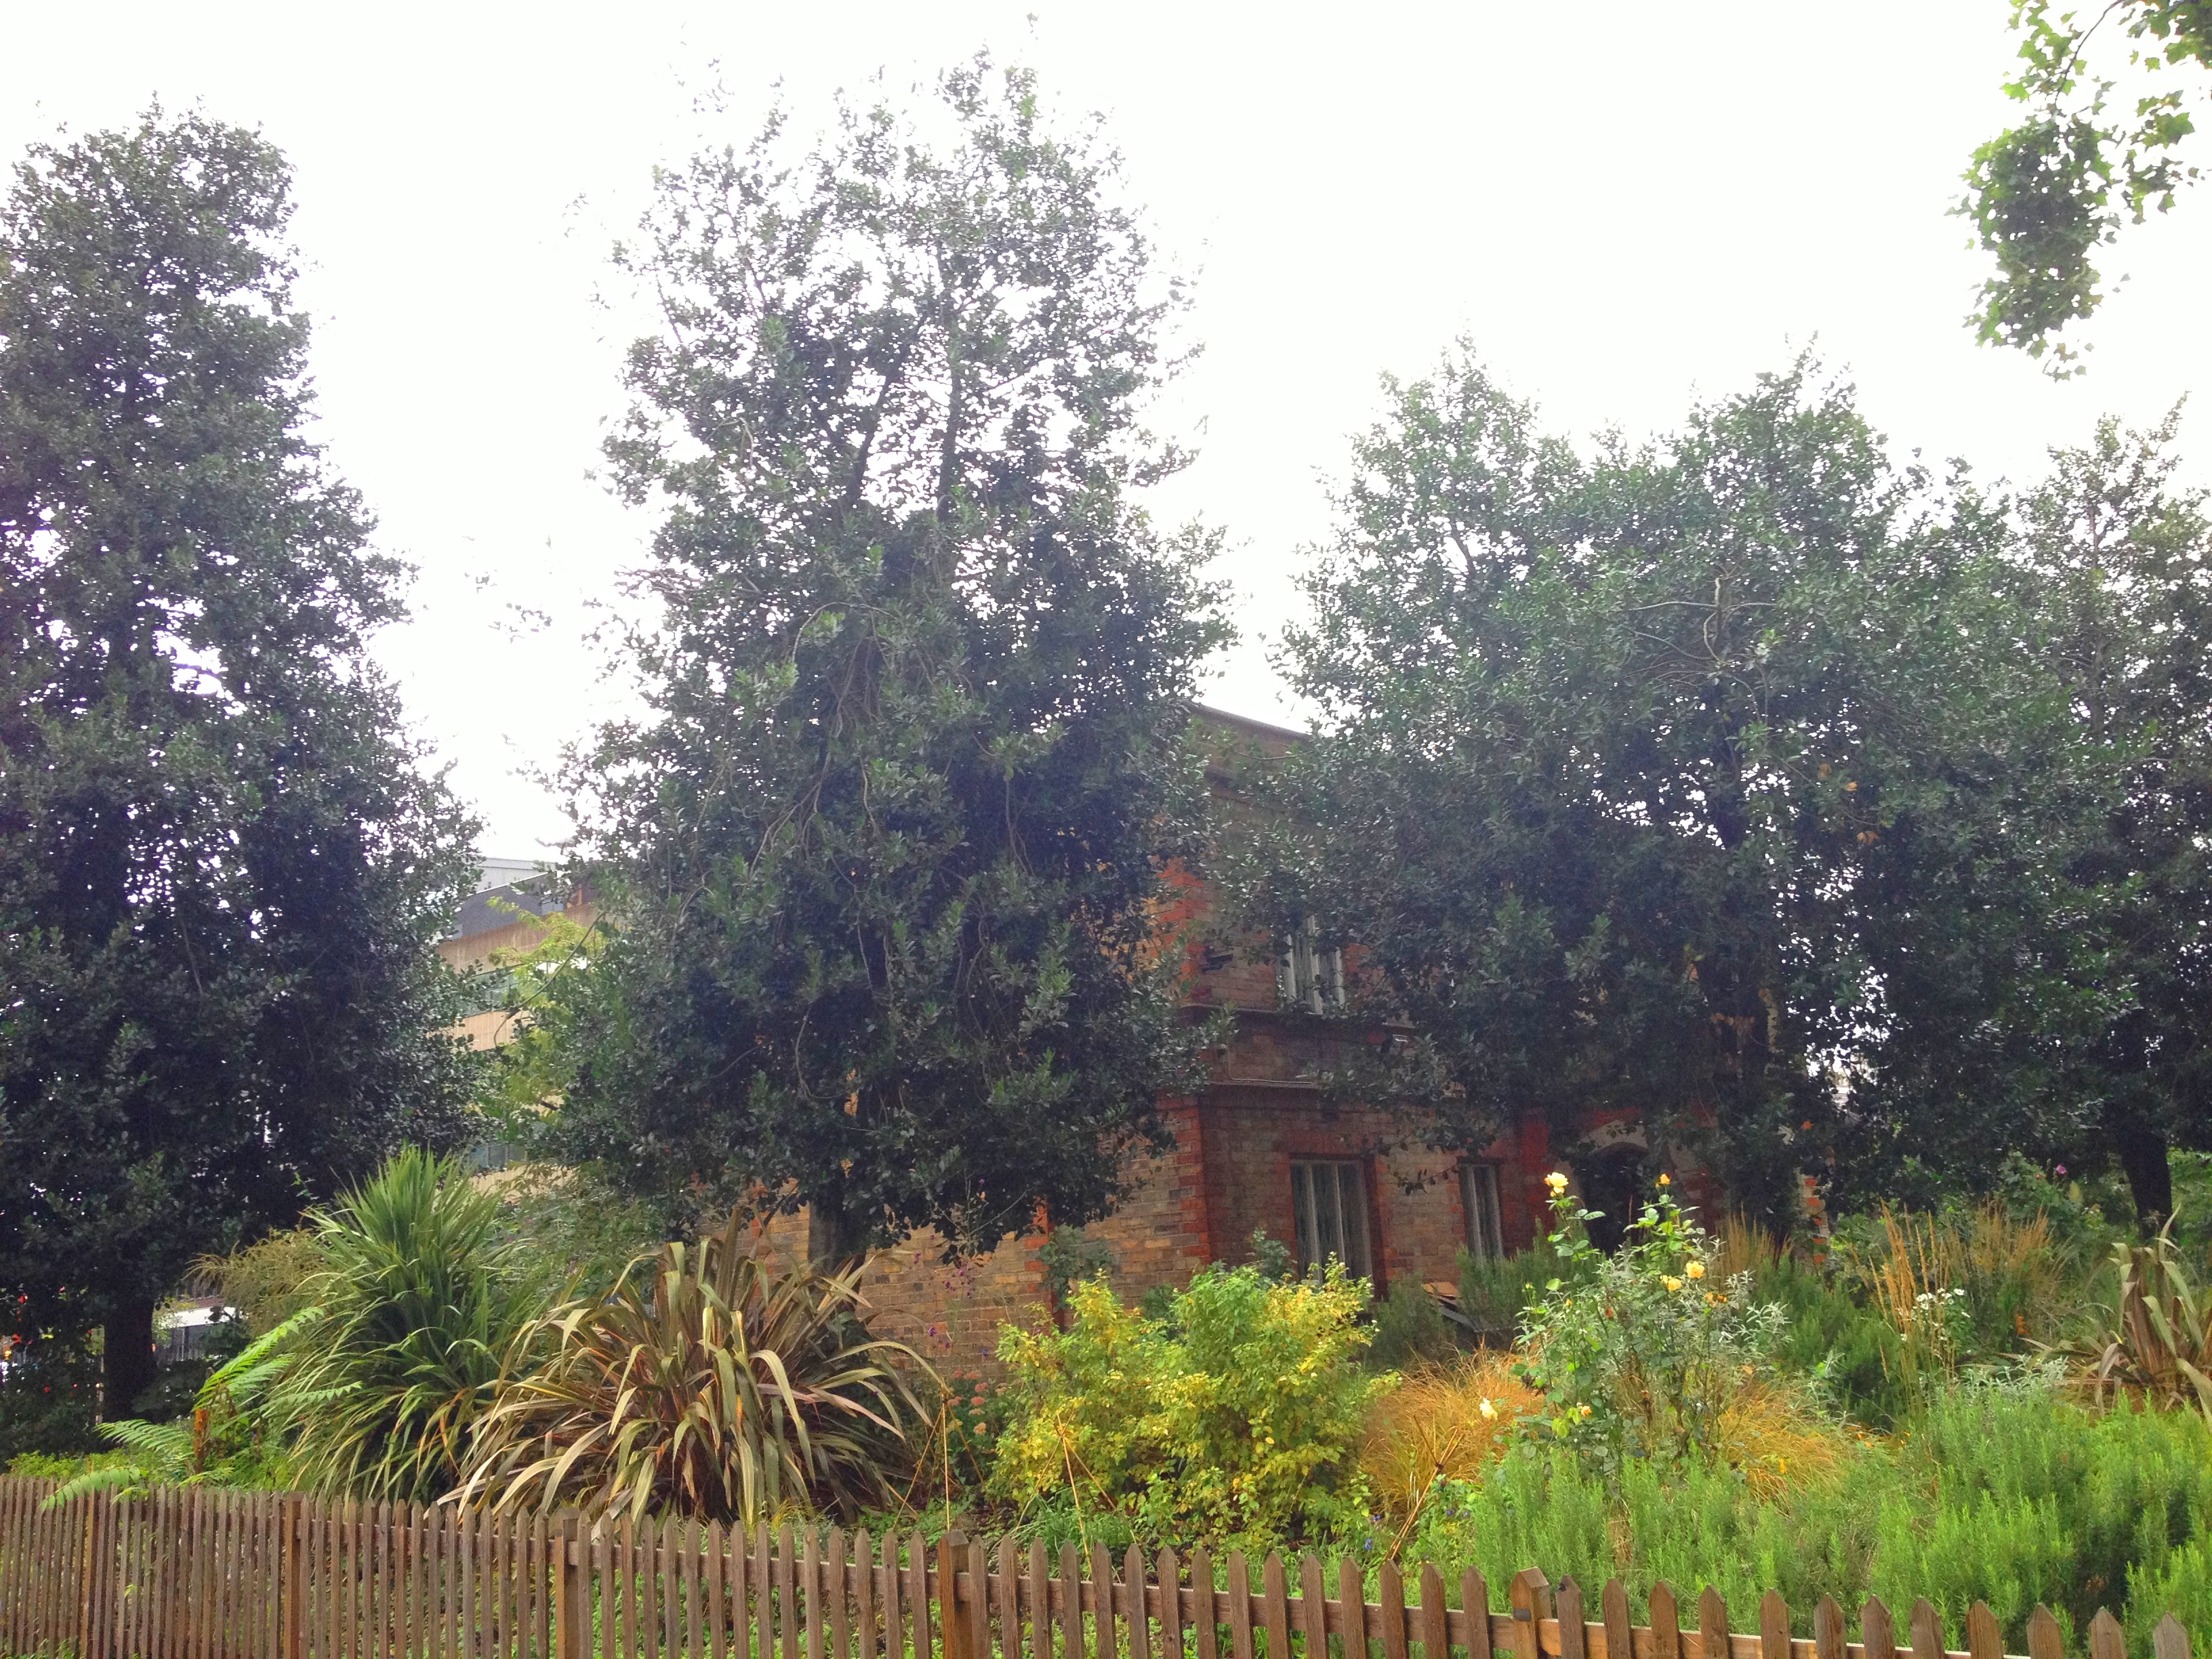 Prince Consort Lodge, Kennington Park - kenningtonrunoff.com